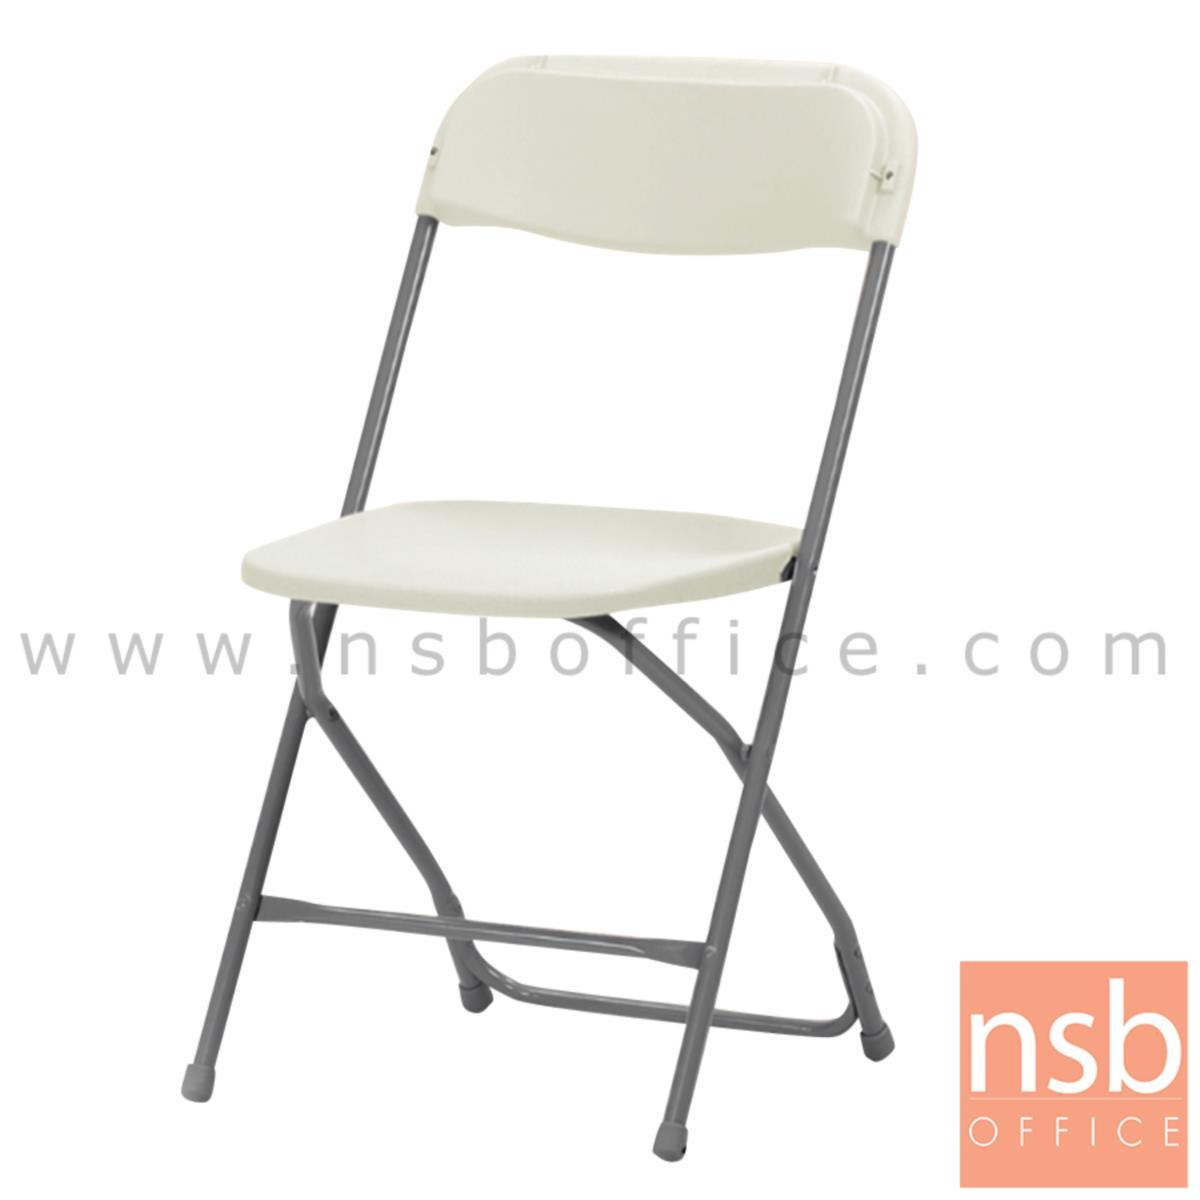 A19A015:เก้าอี้พับที่นั่งพลาสติก รุ่น Randolph (แรนดอล์ฟ) ขาเหล็ก